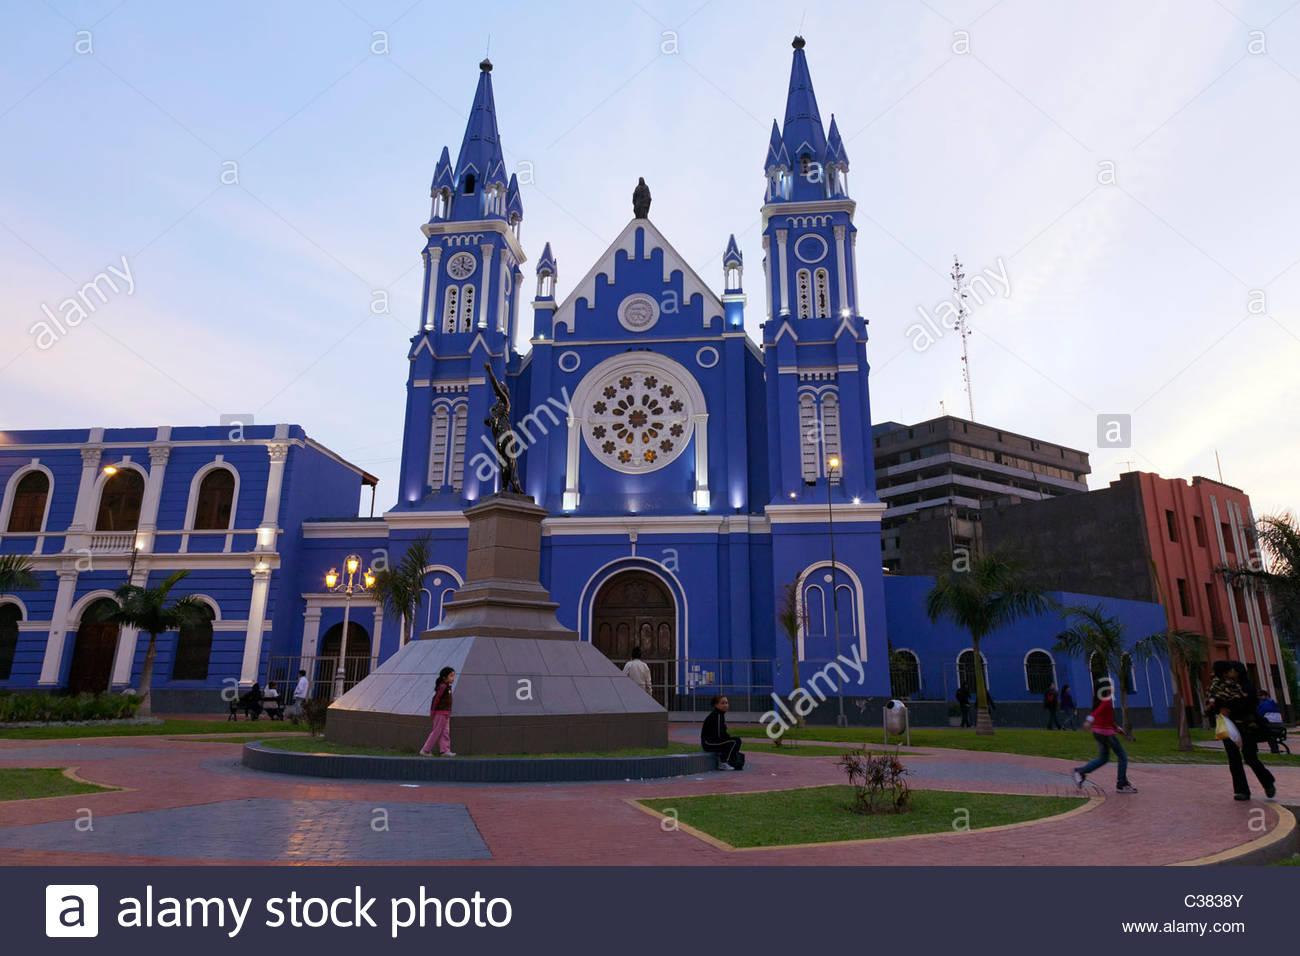 iglesia la recoleta church plaza francia in lima peru